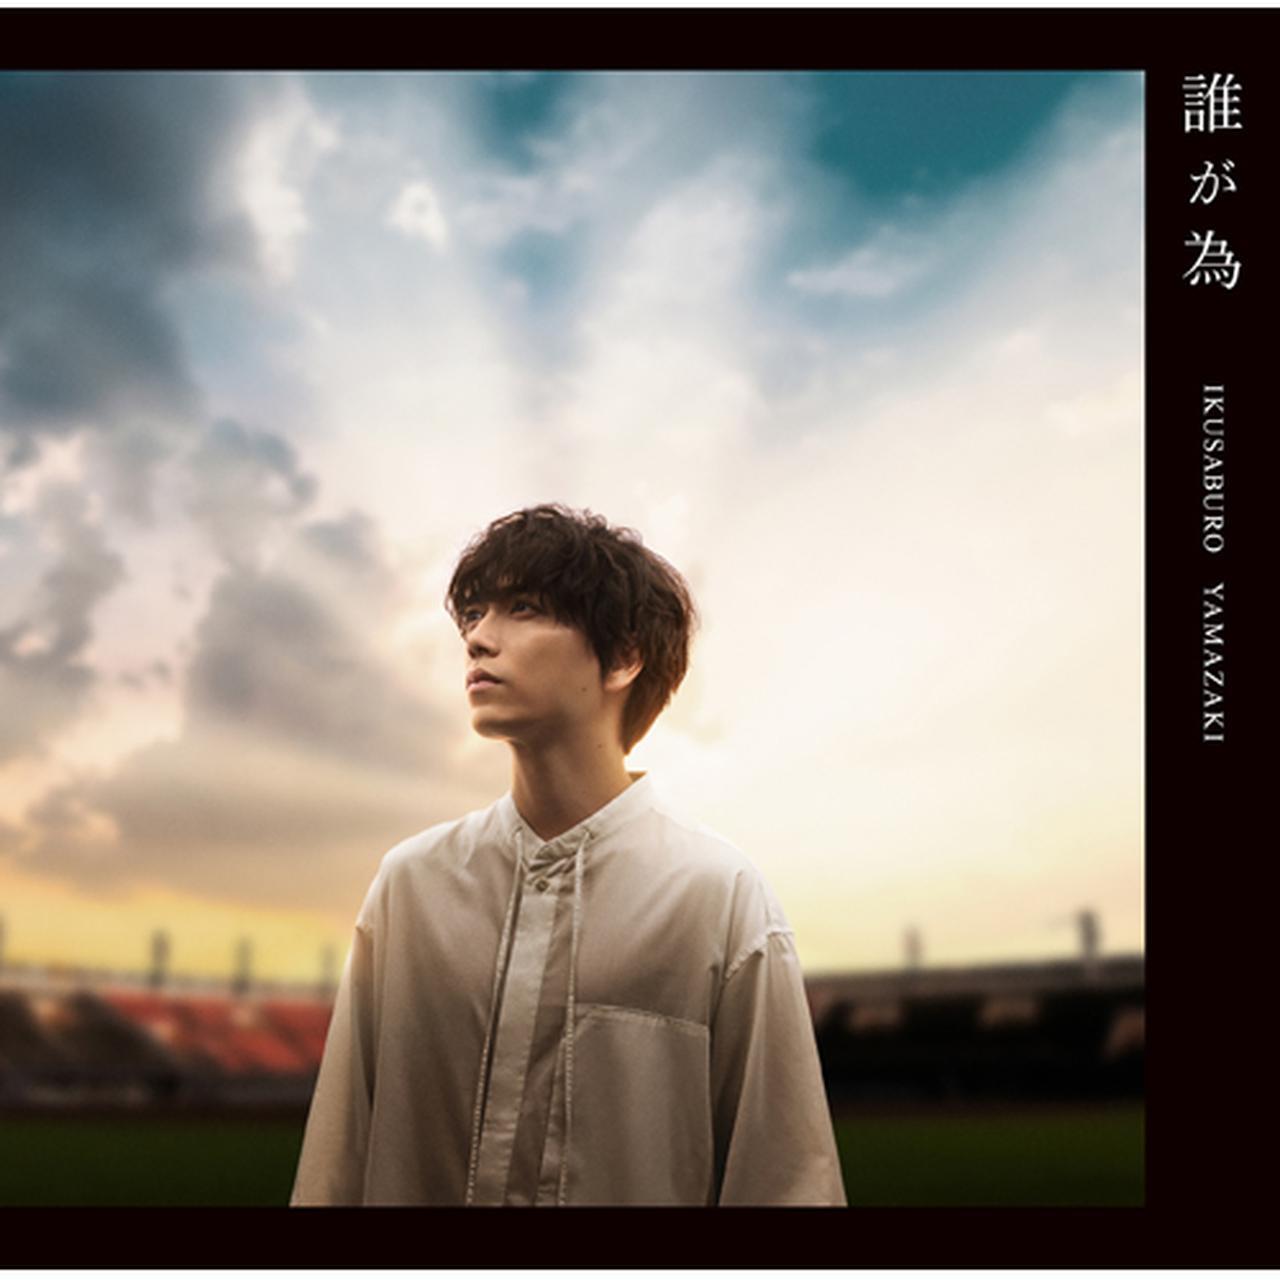 画像: 誰が為 [初回限定盤][CD MAXI][+DVD] - 山崎育三郎 - UNIVERSAL MUSIC JAPAN